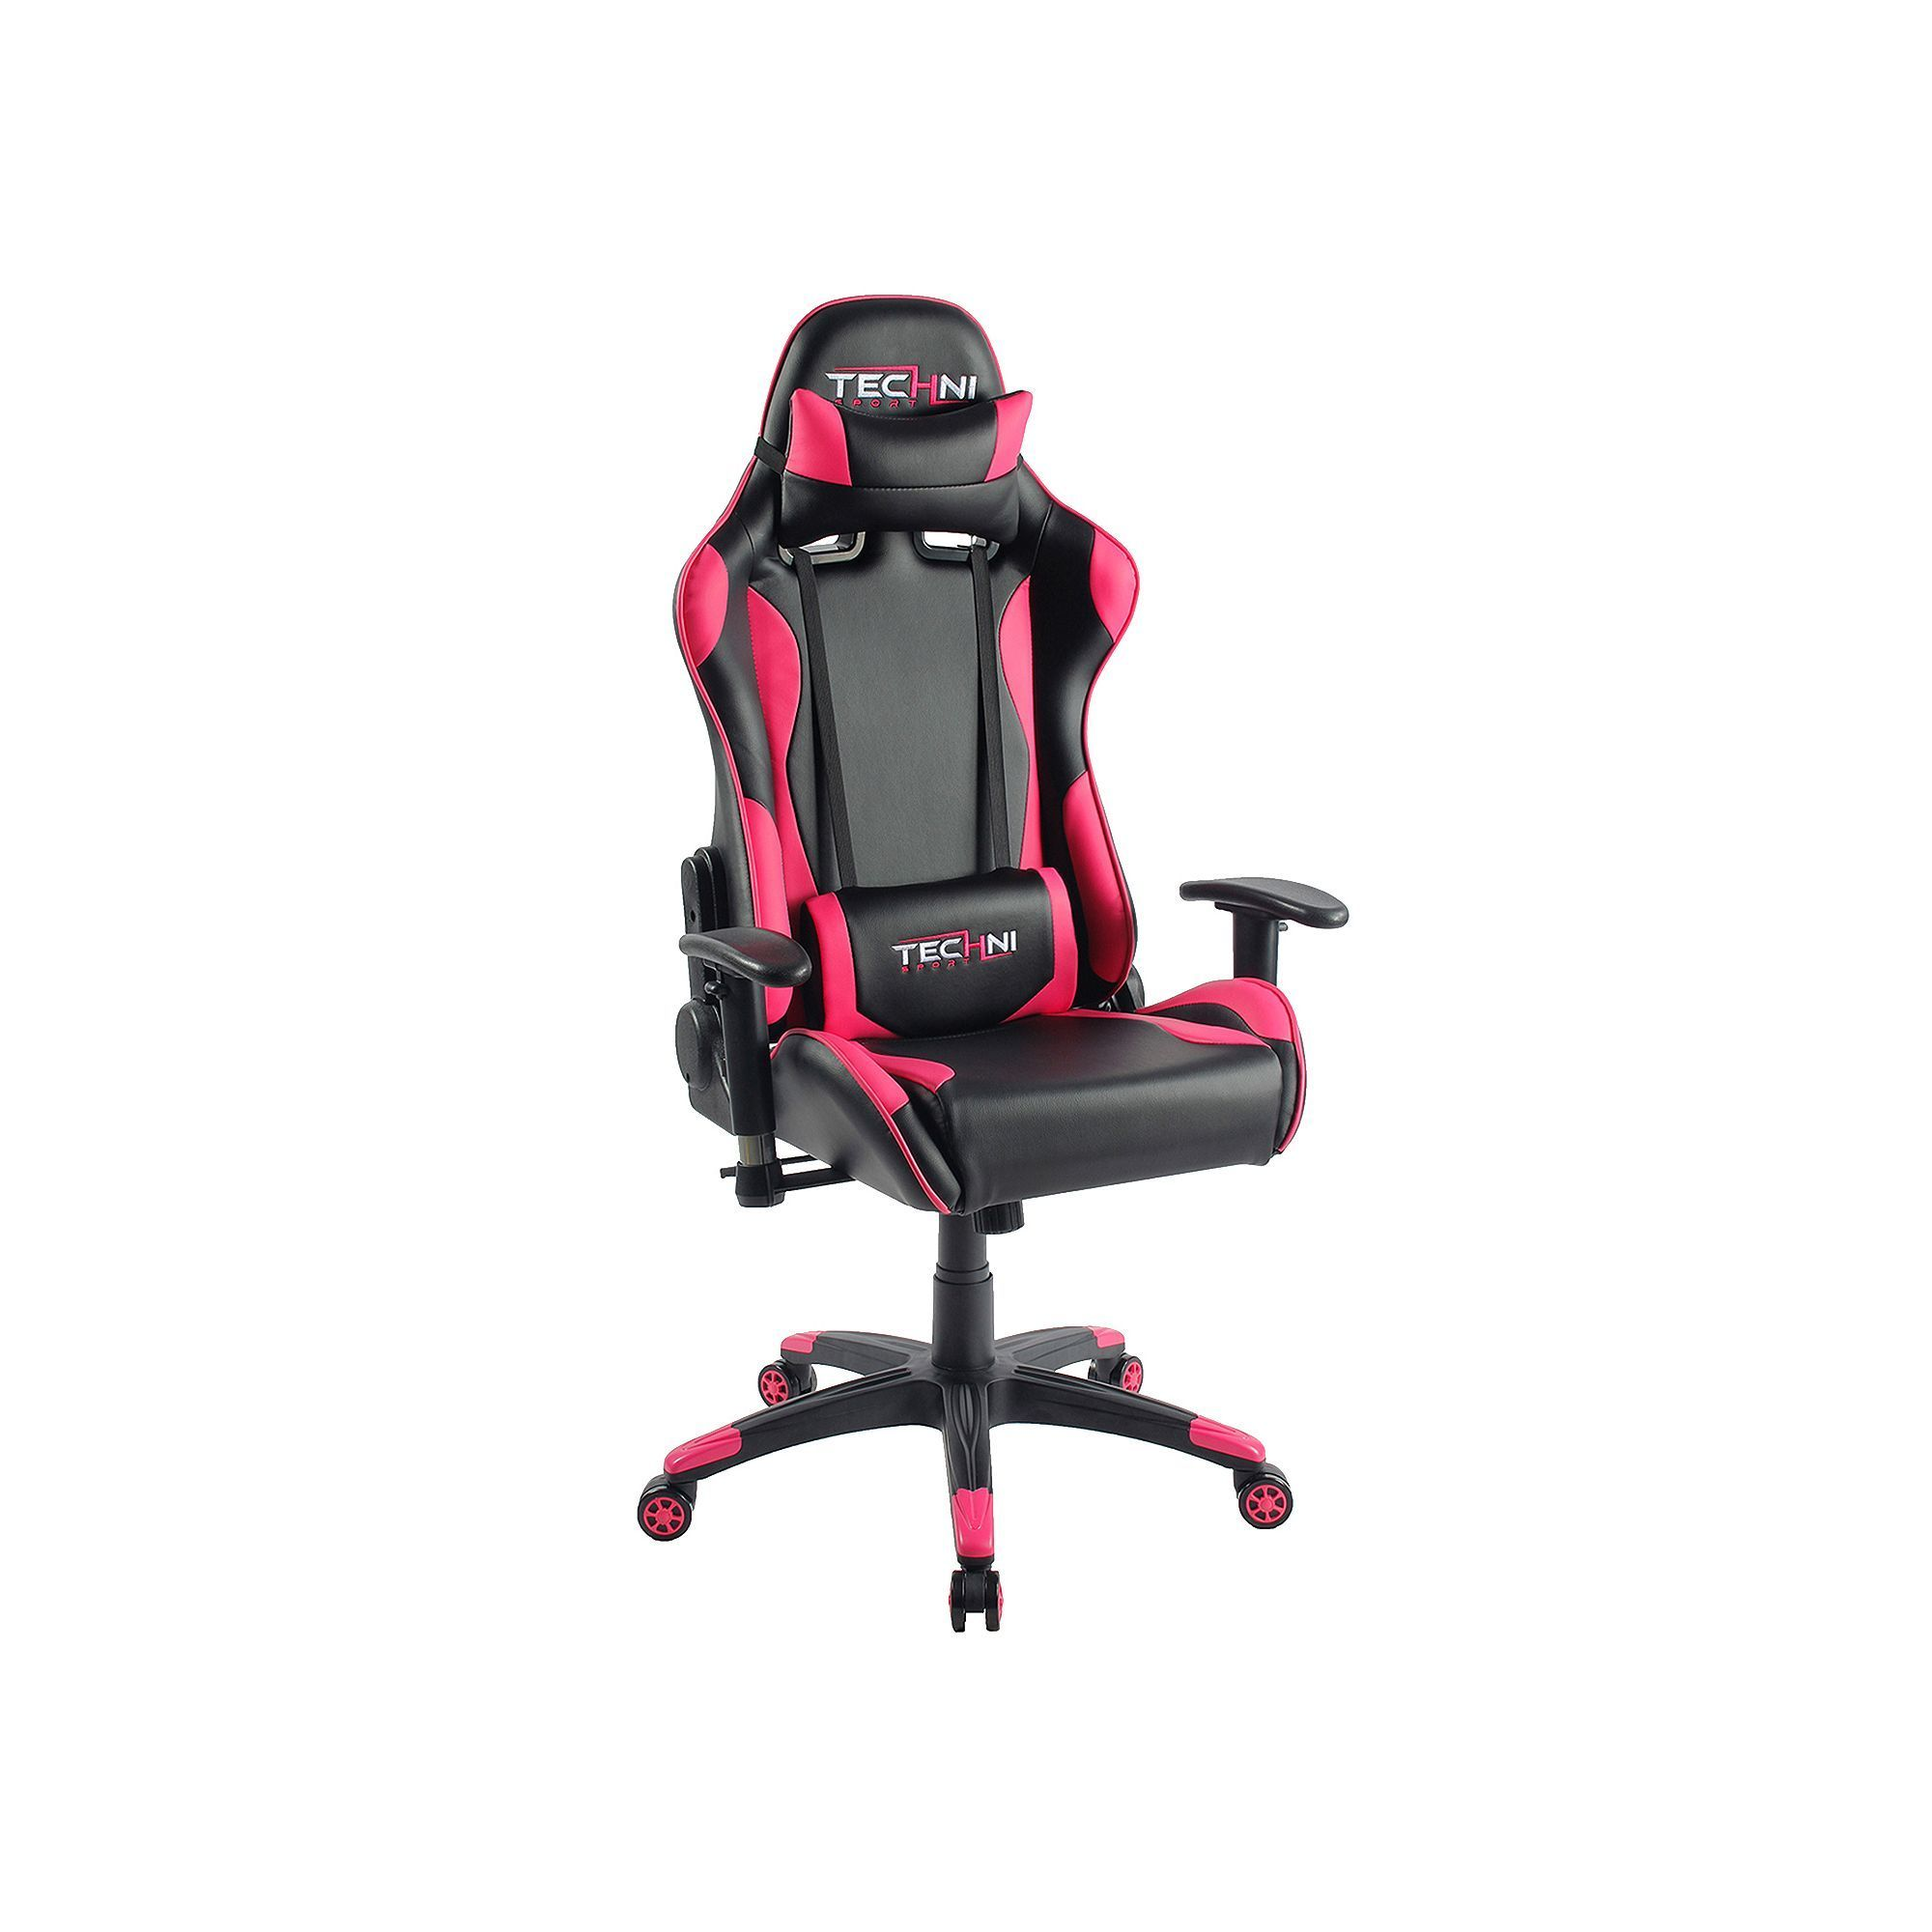 Techni Sport Ergonomic HighBack Gaming Desk Chair, Pink